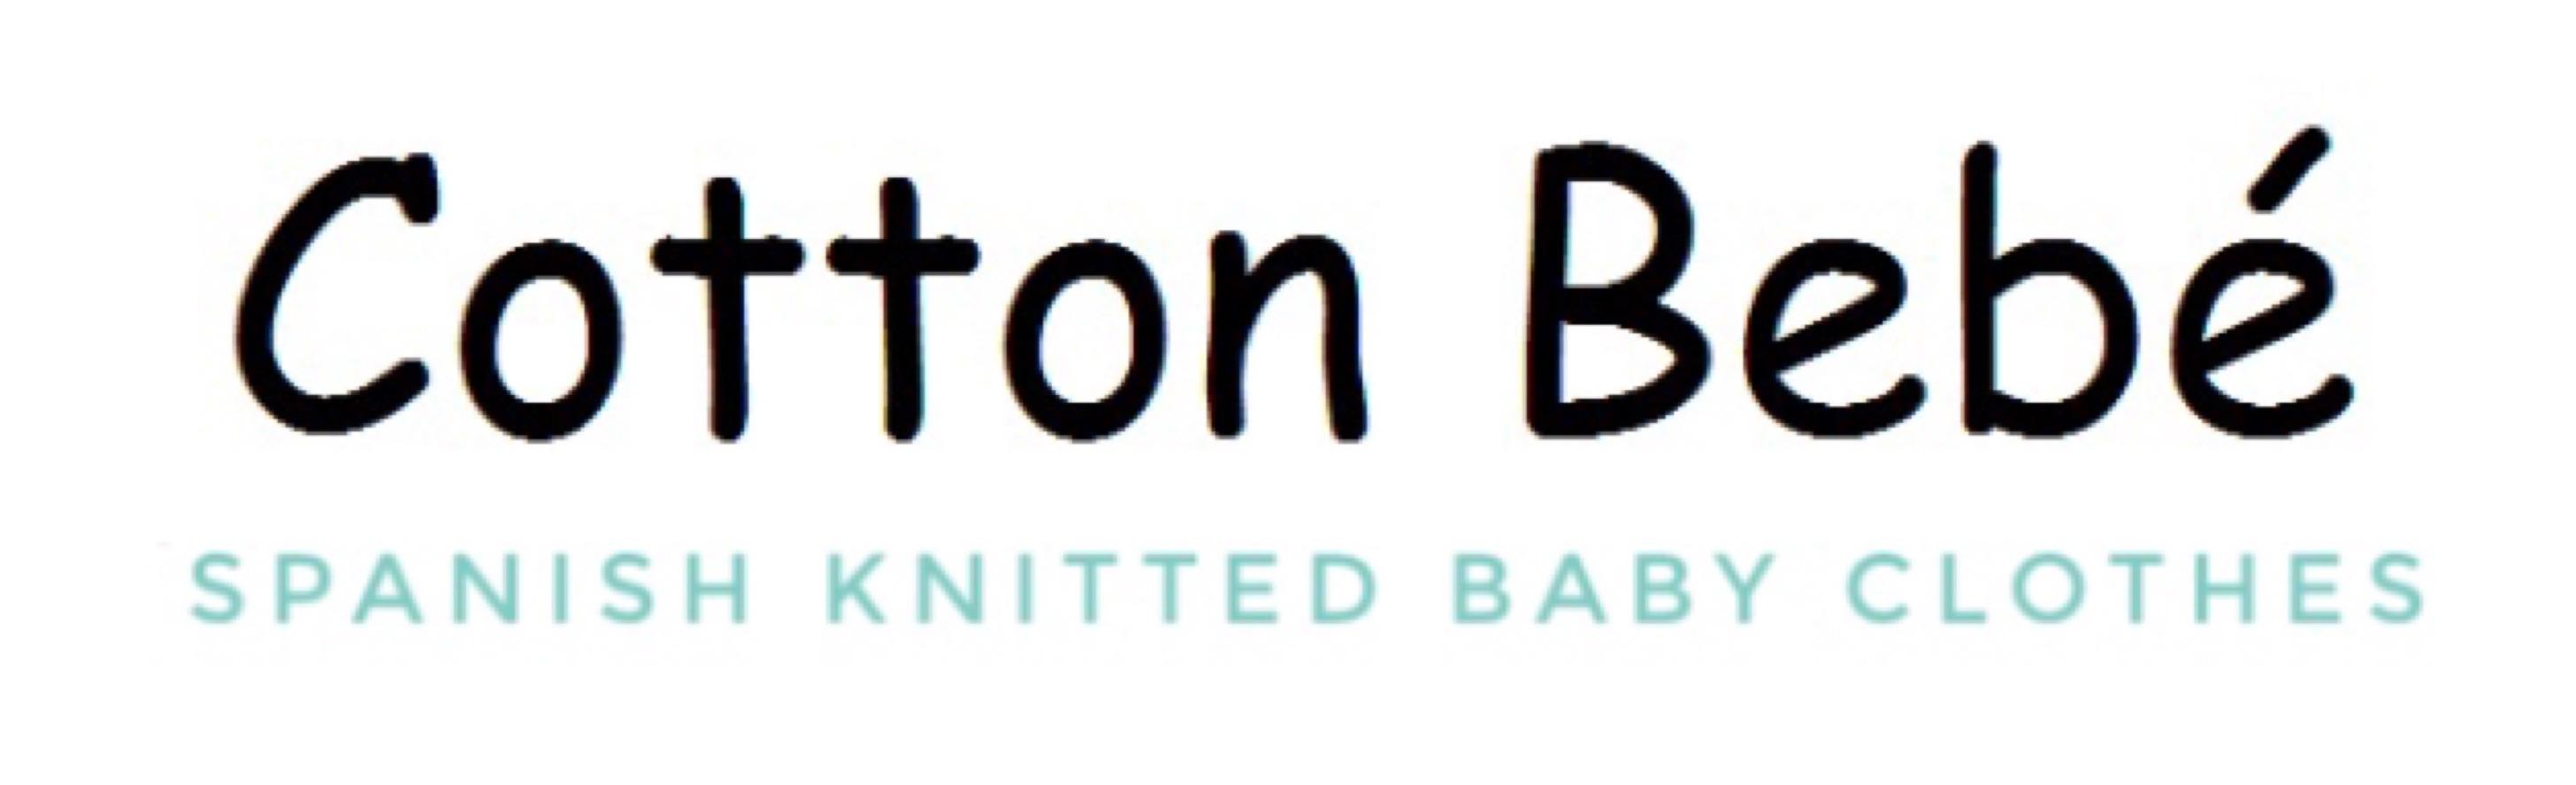 Cotton Bebe